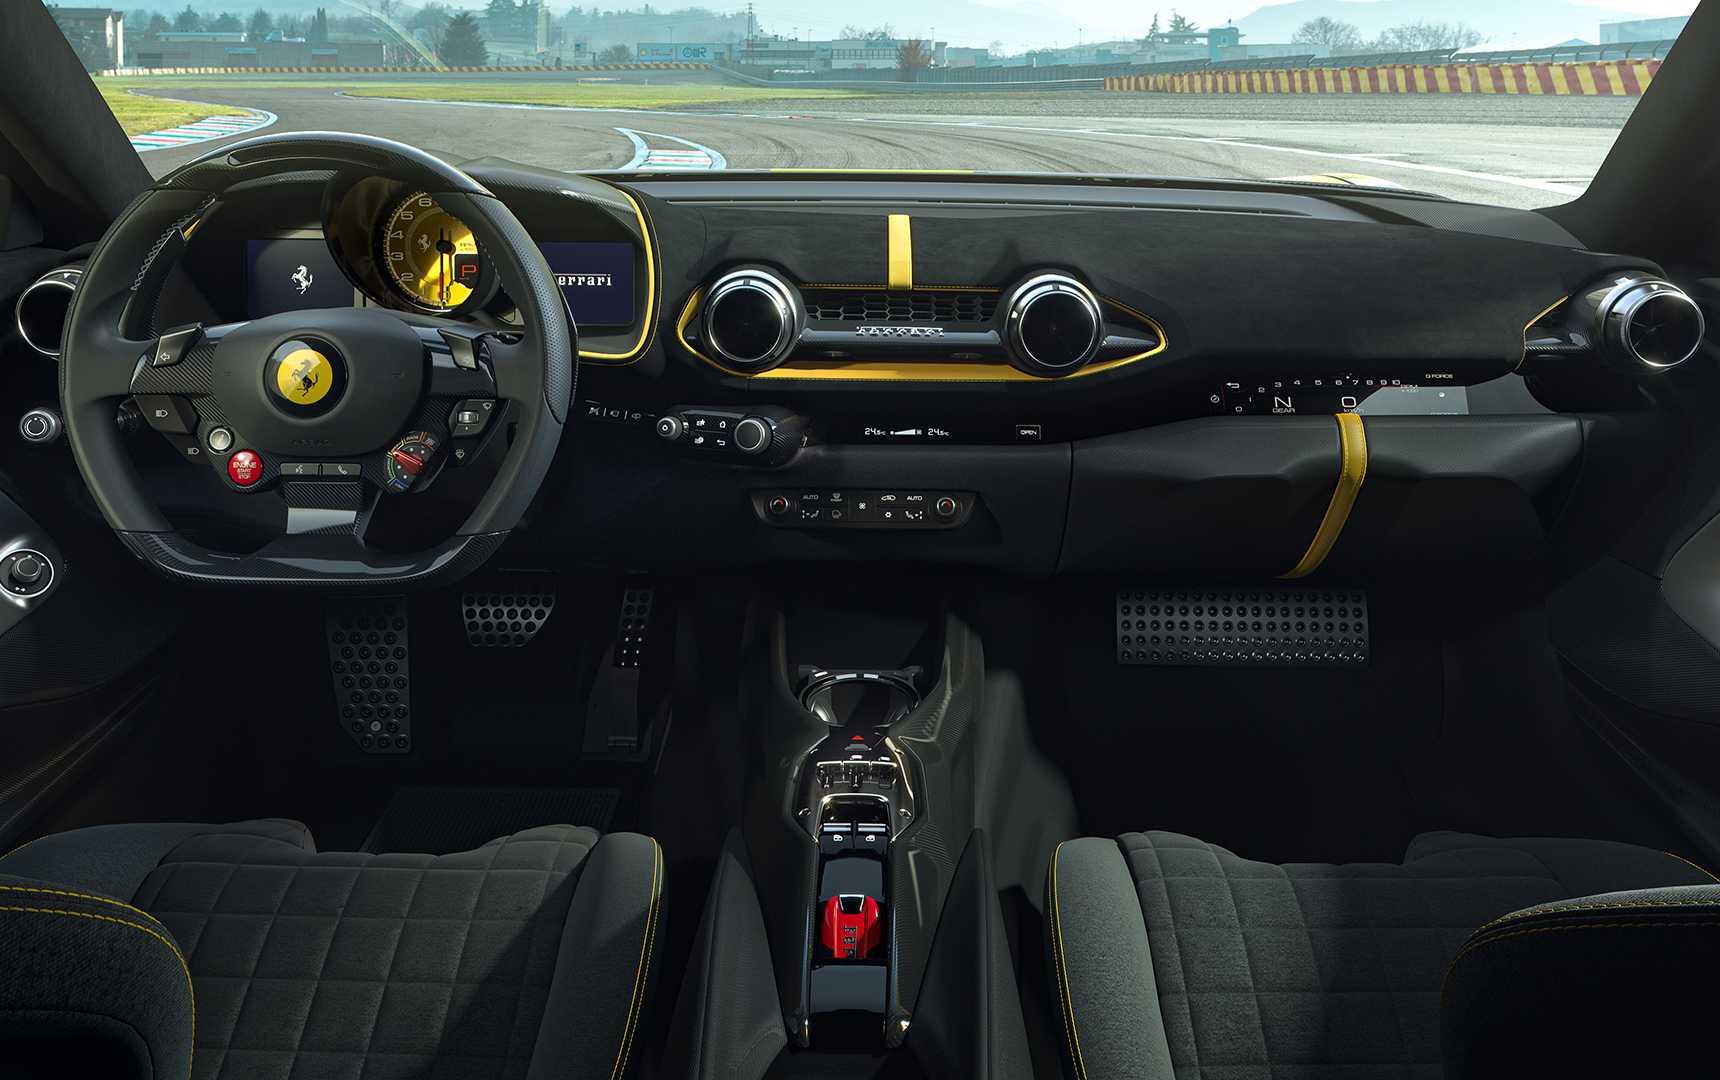 Ferrari-812-giới-hạn-ra-mắt (2).jpg